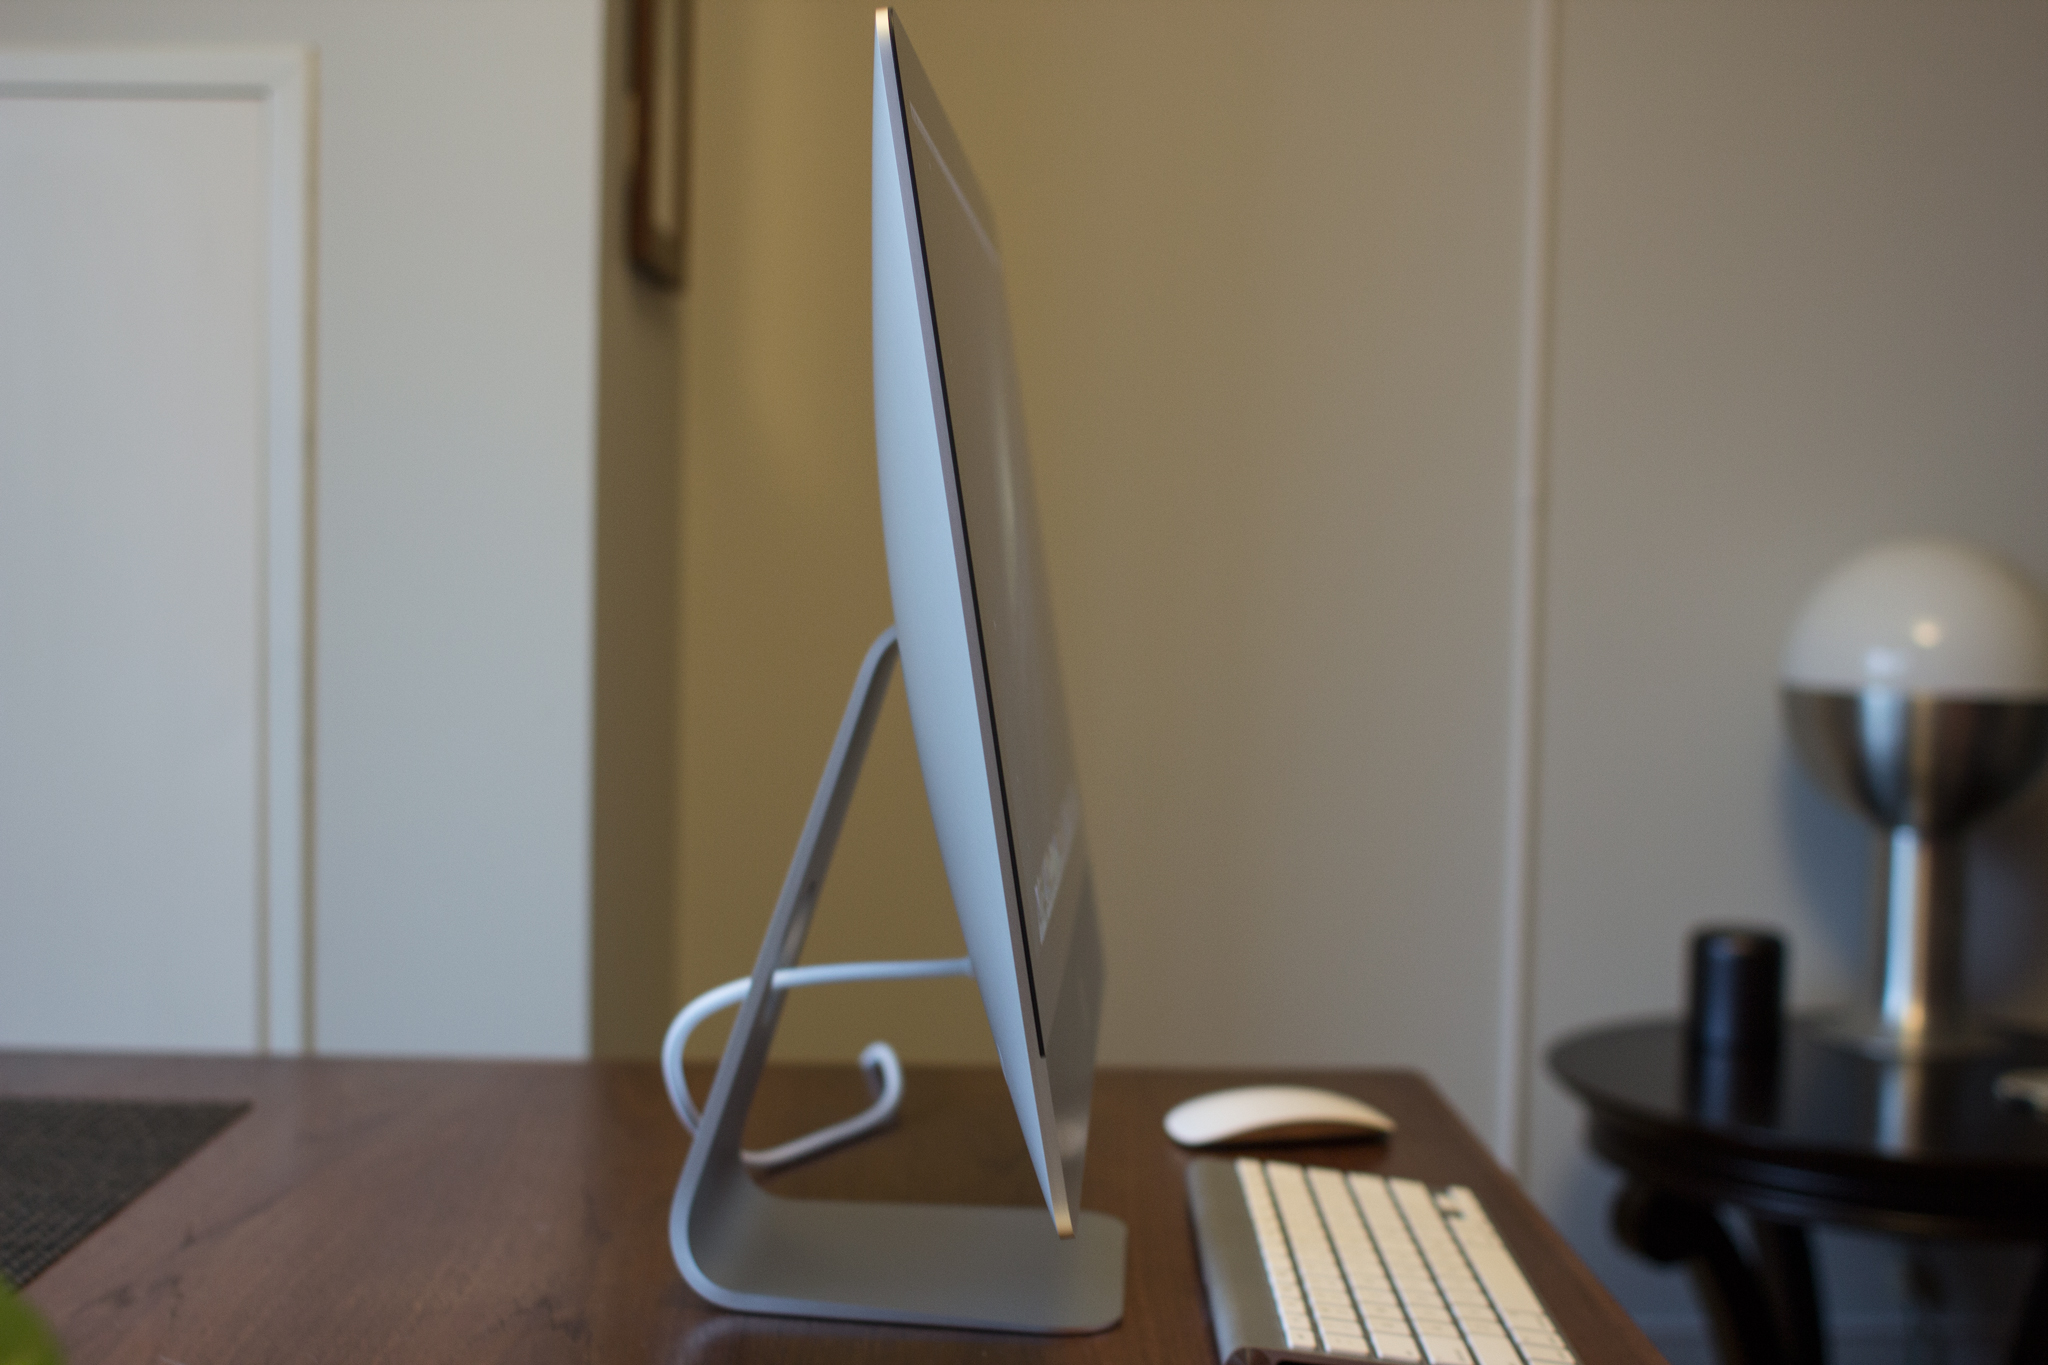 21.5-inch 2012 iMac, side view